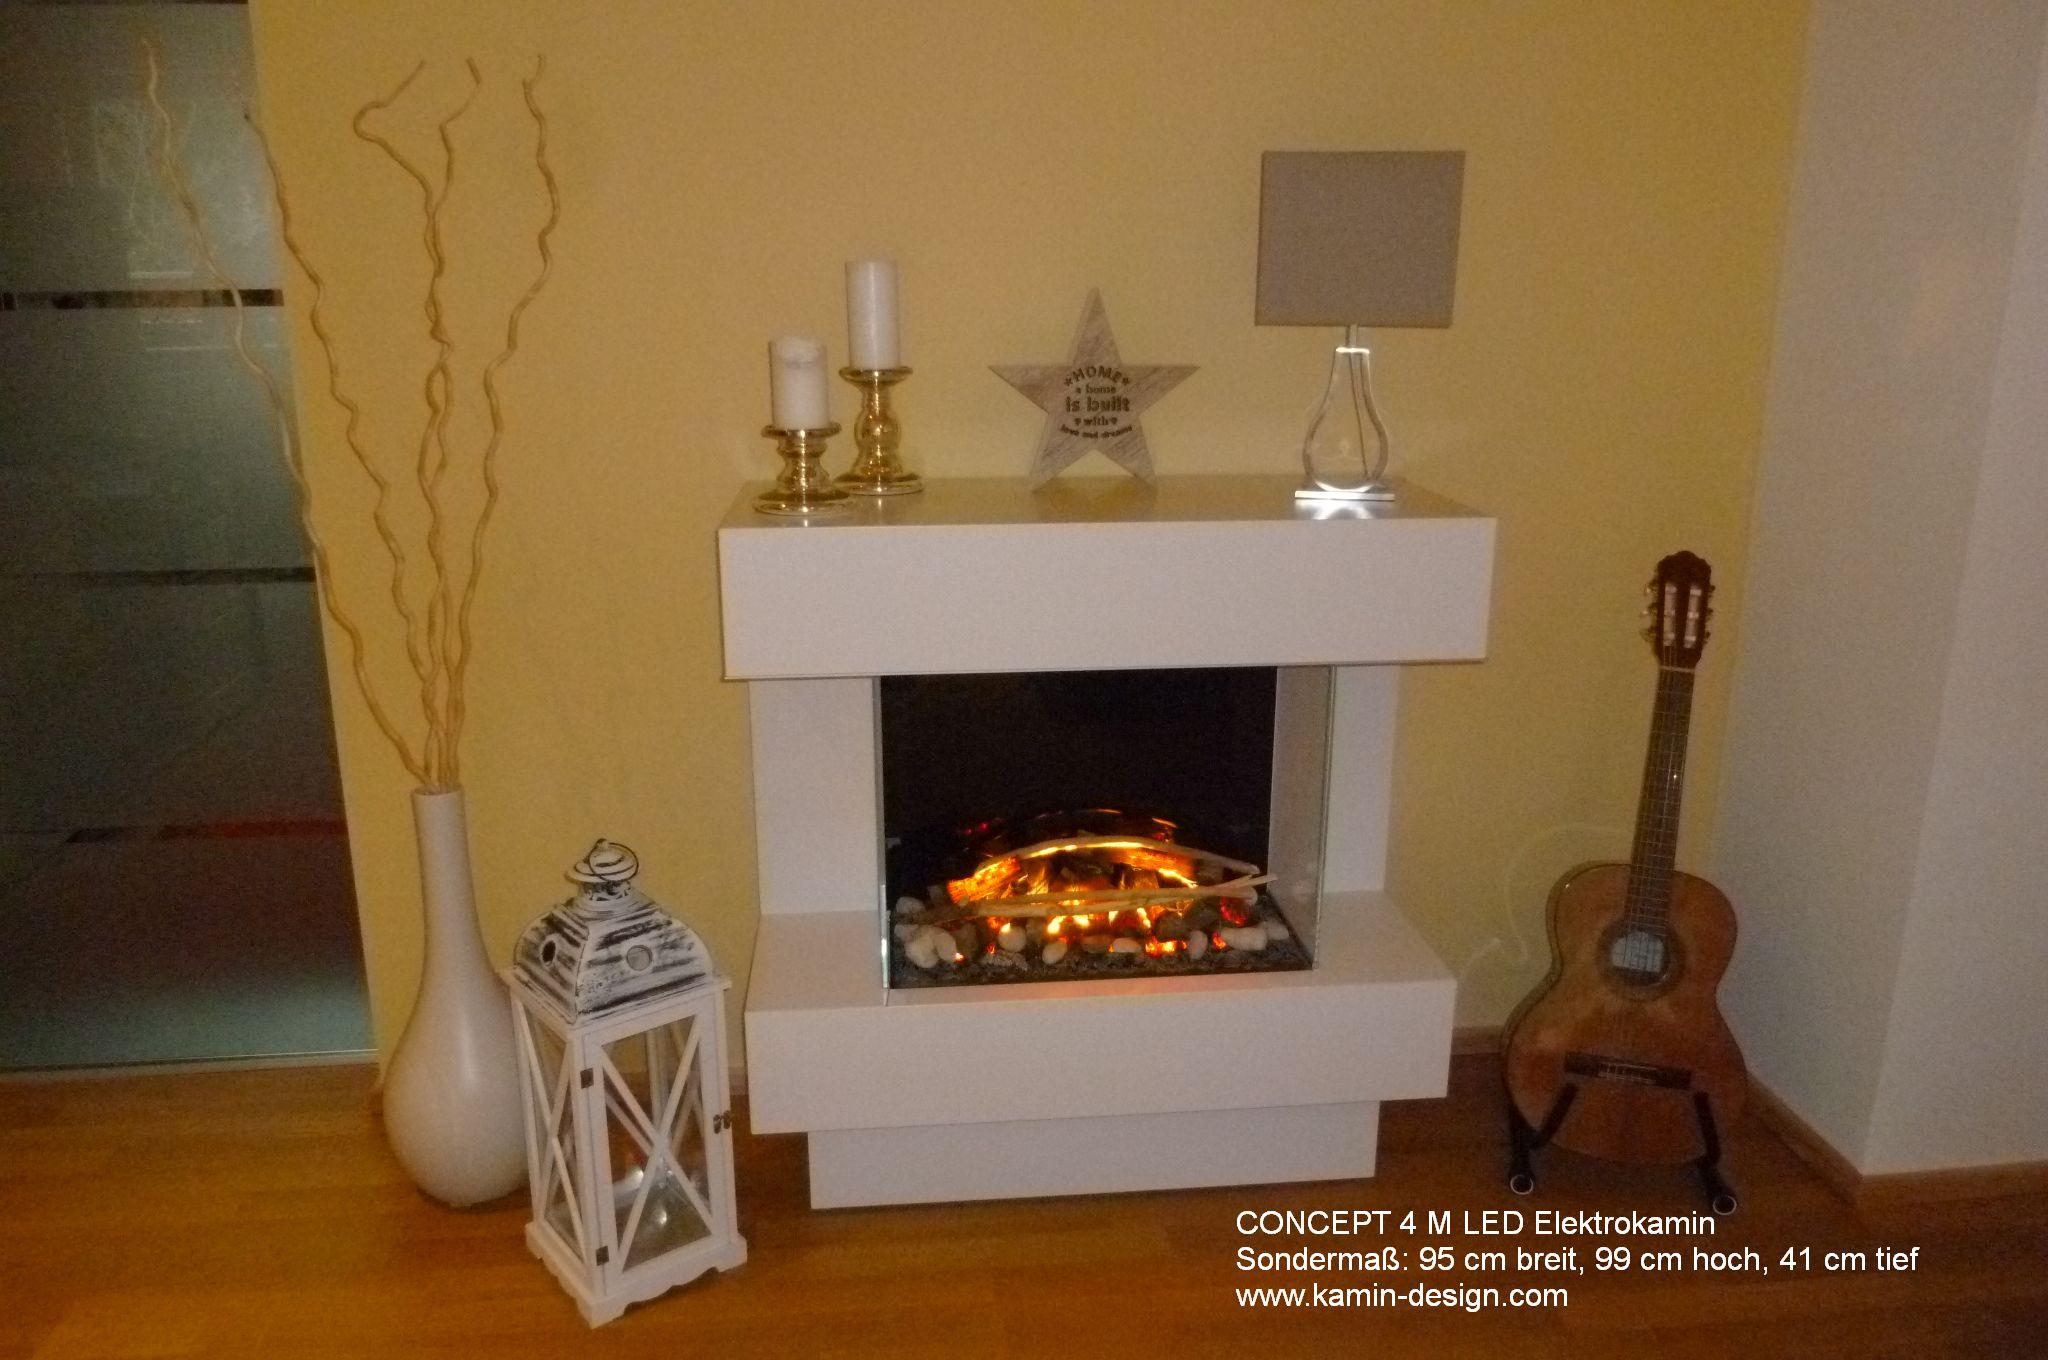 elektrokamin concept 4 m led 800 mit opti myst elektrofeuertechnik. Black Bedroom Furniture Sets. Home Design Ideas